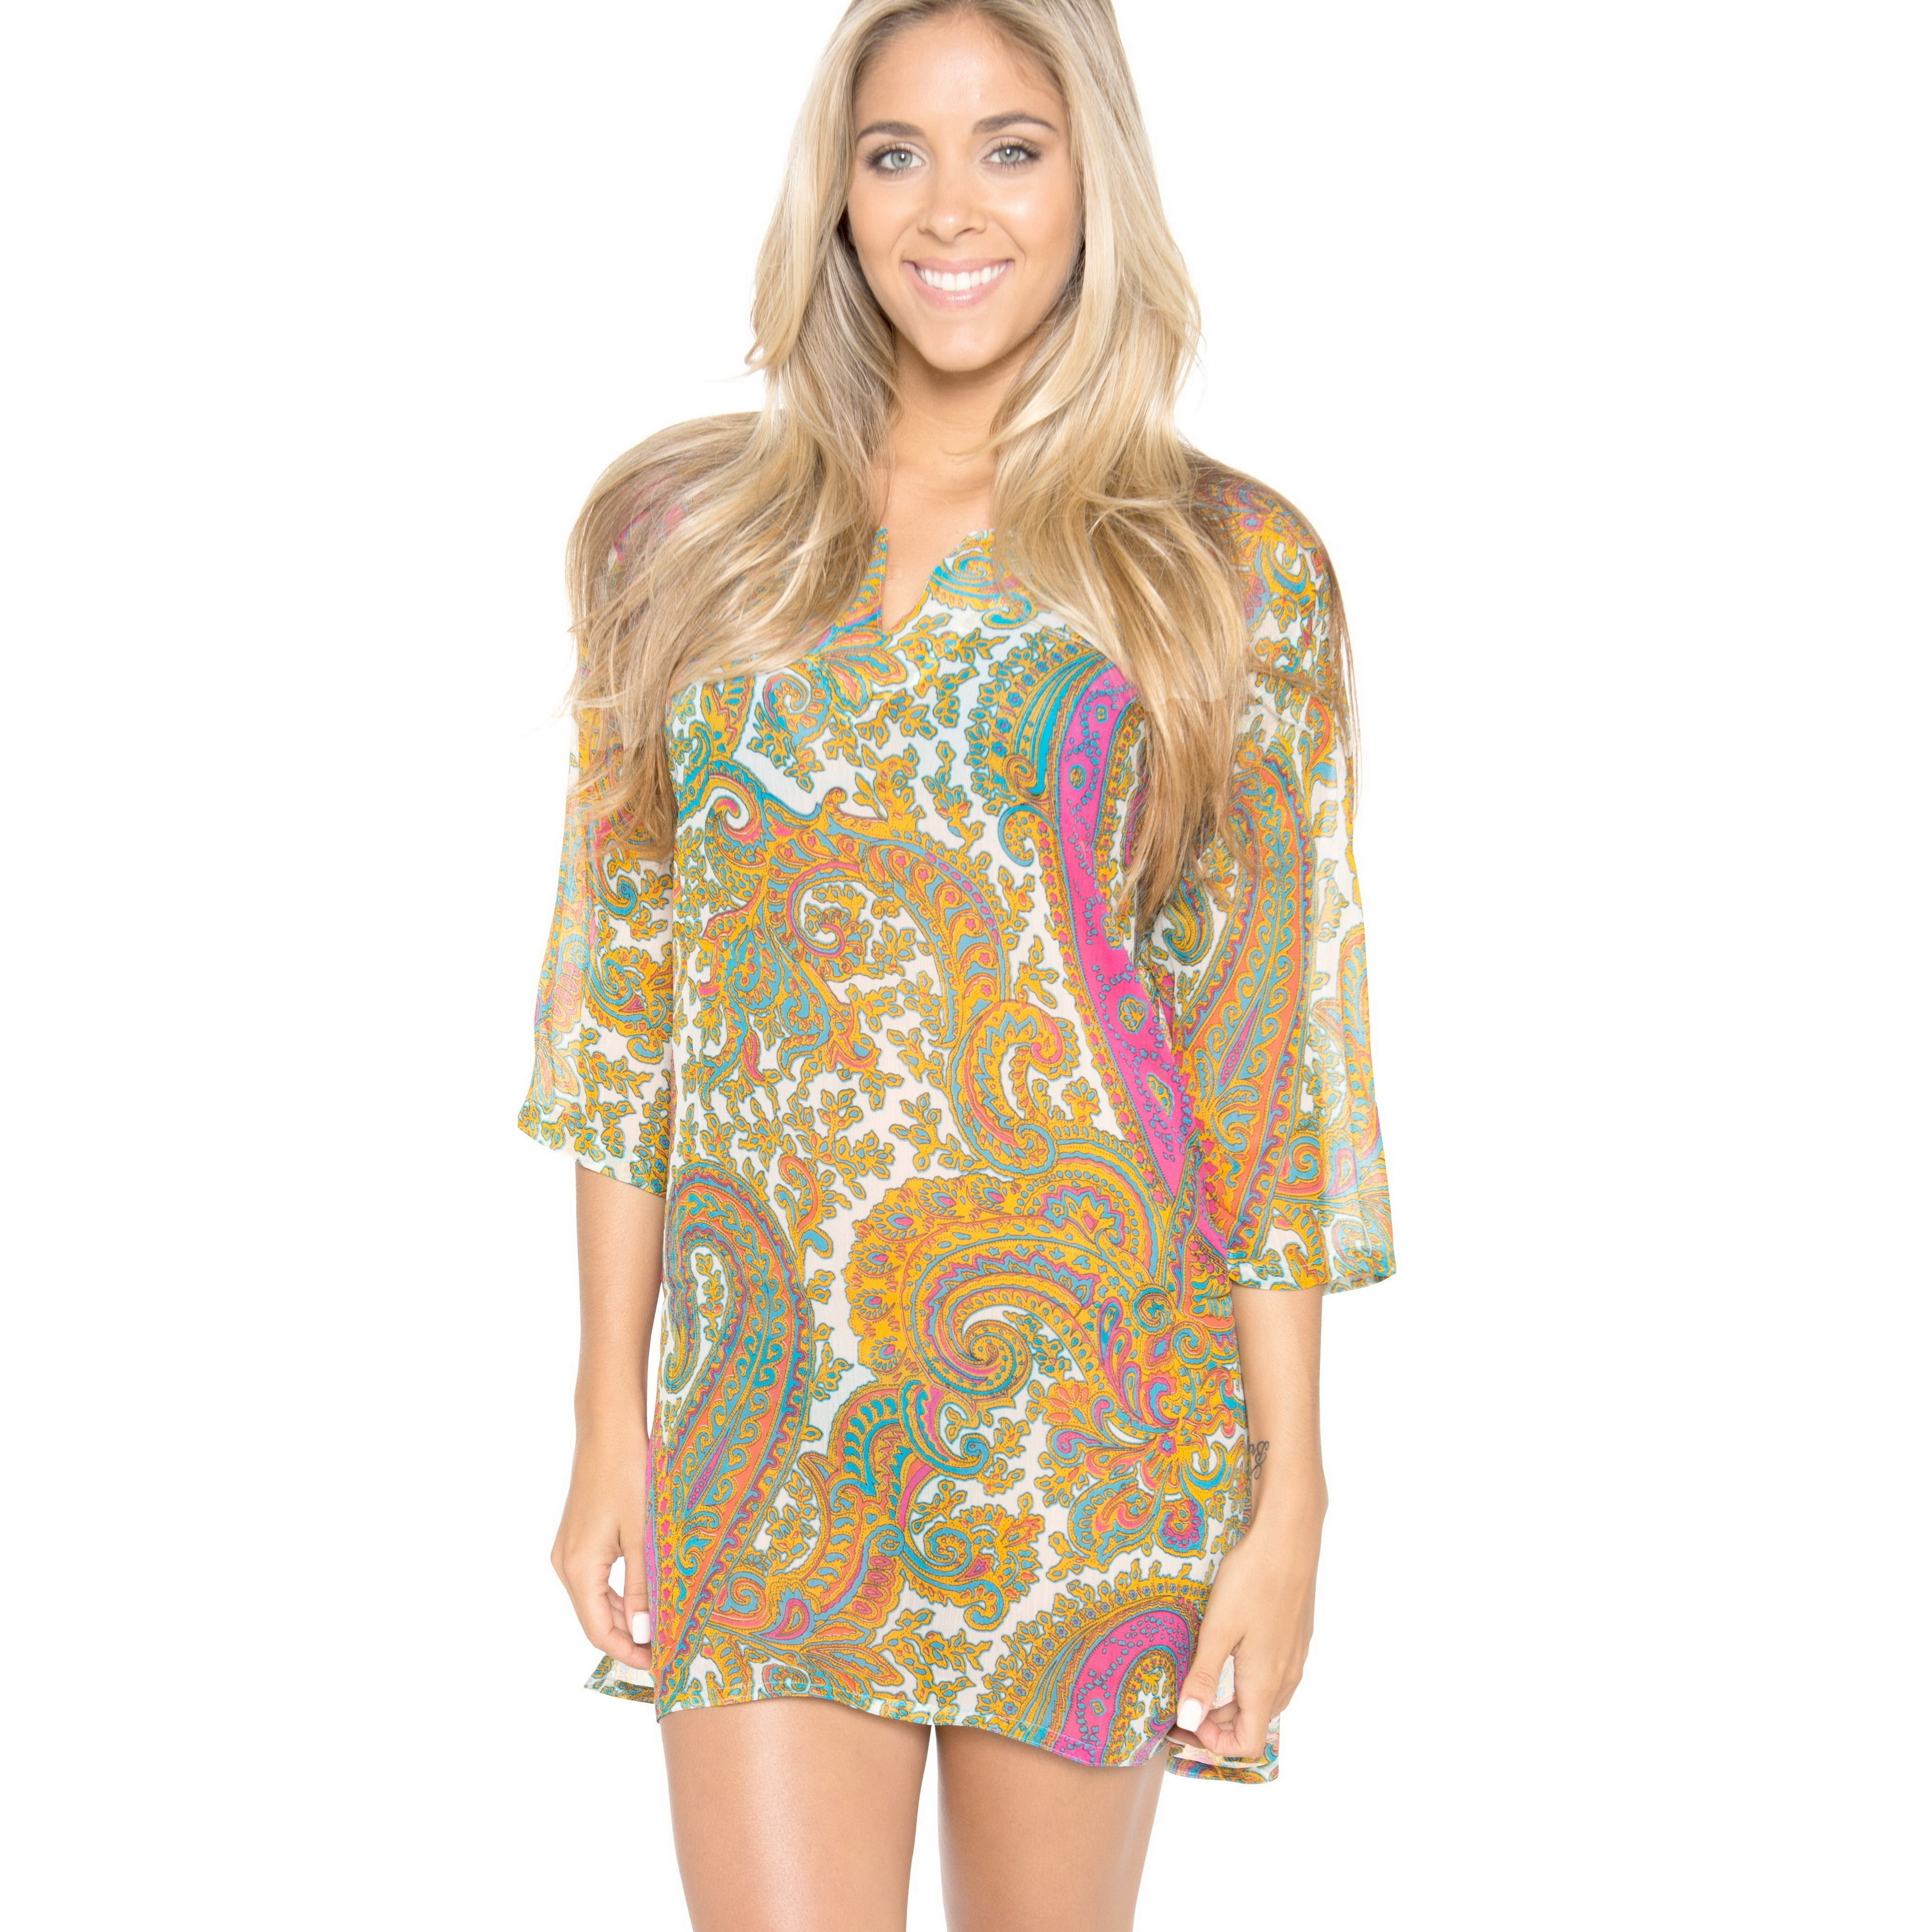 5ba202be79440 Shop La Leela LIGHTWEIGHT CHIFFON Paisley Beach Swimsuit Kaftan Dress  Bikini Cover up L - Free Shipping On Orders Over  45 - Overstock - 10171567